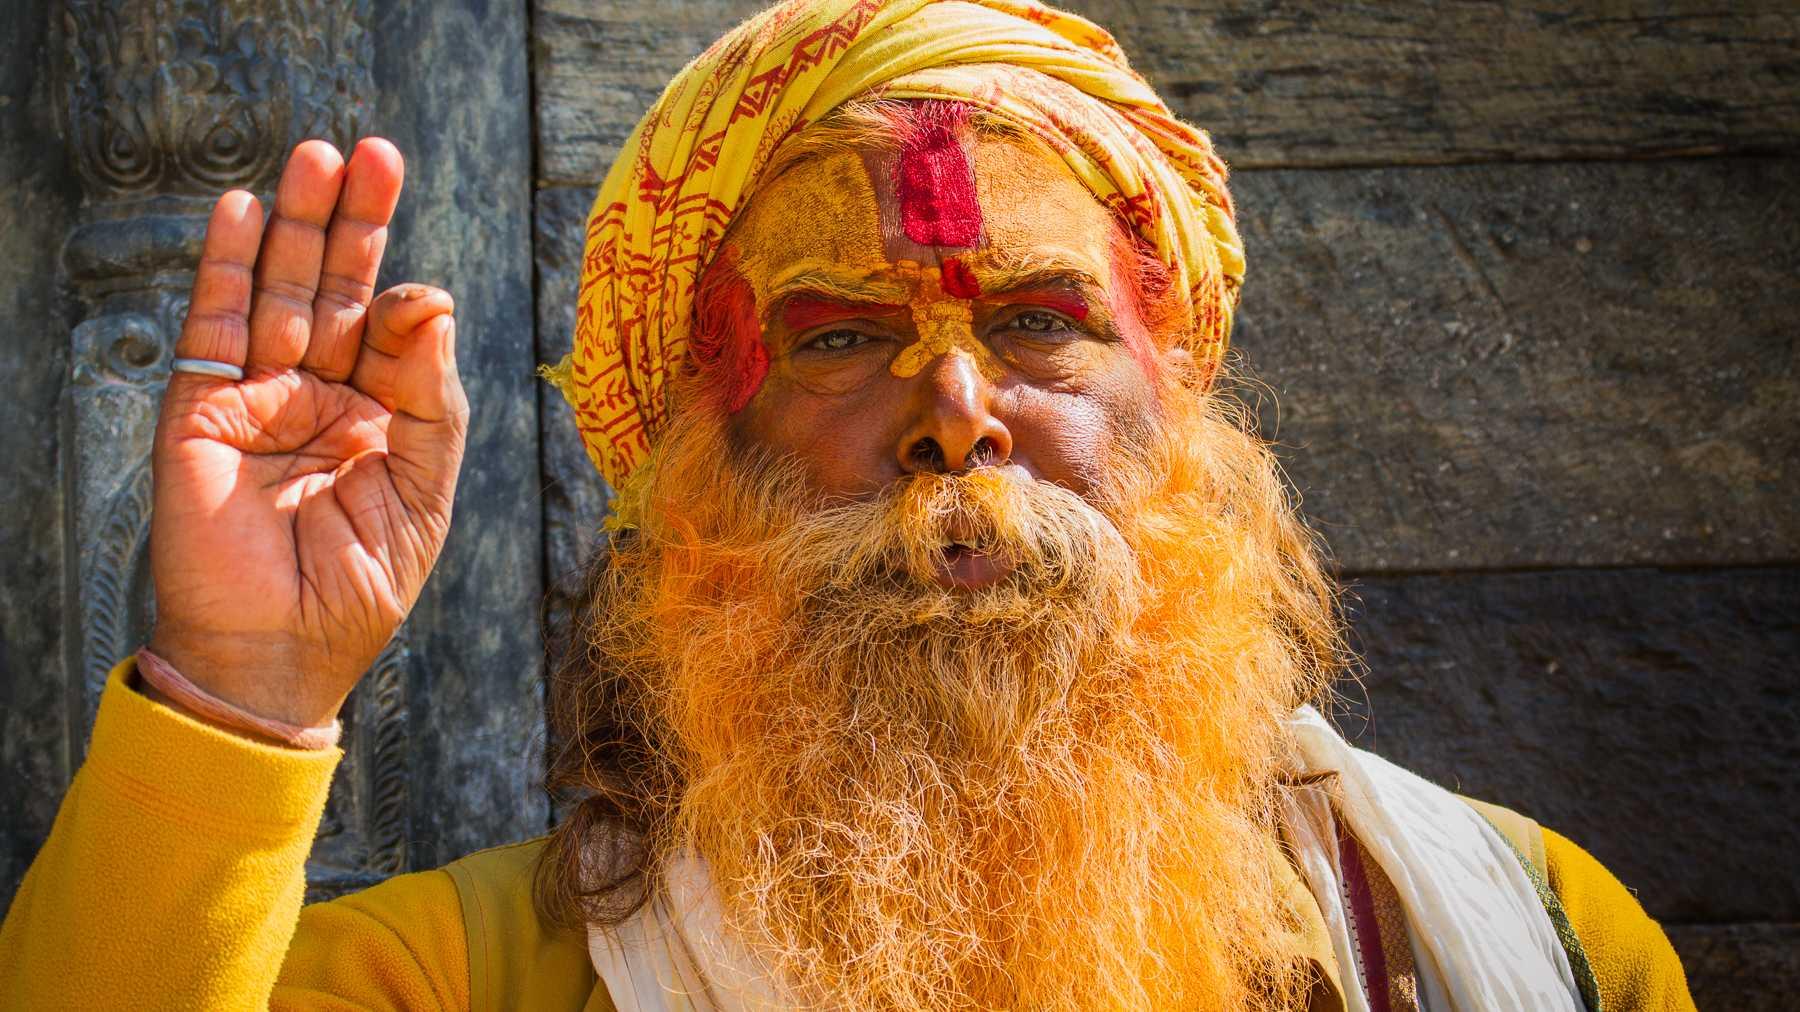 Reisefotografie: c't Fotografie unterwegs in Nepal